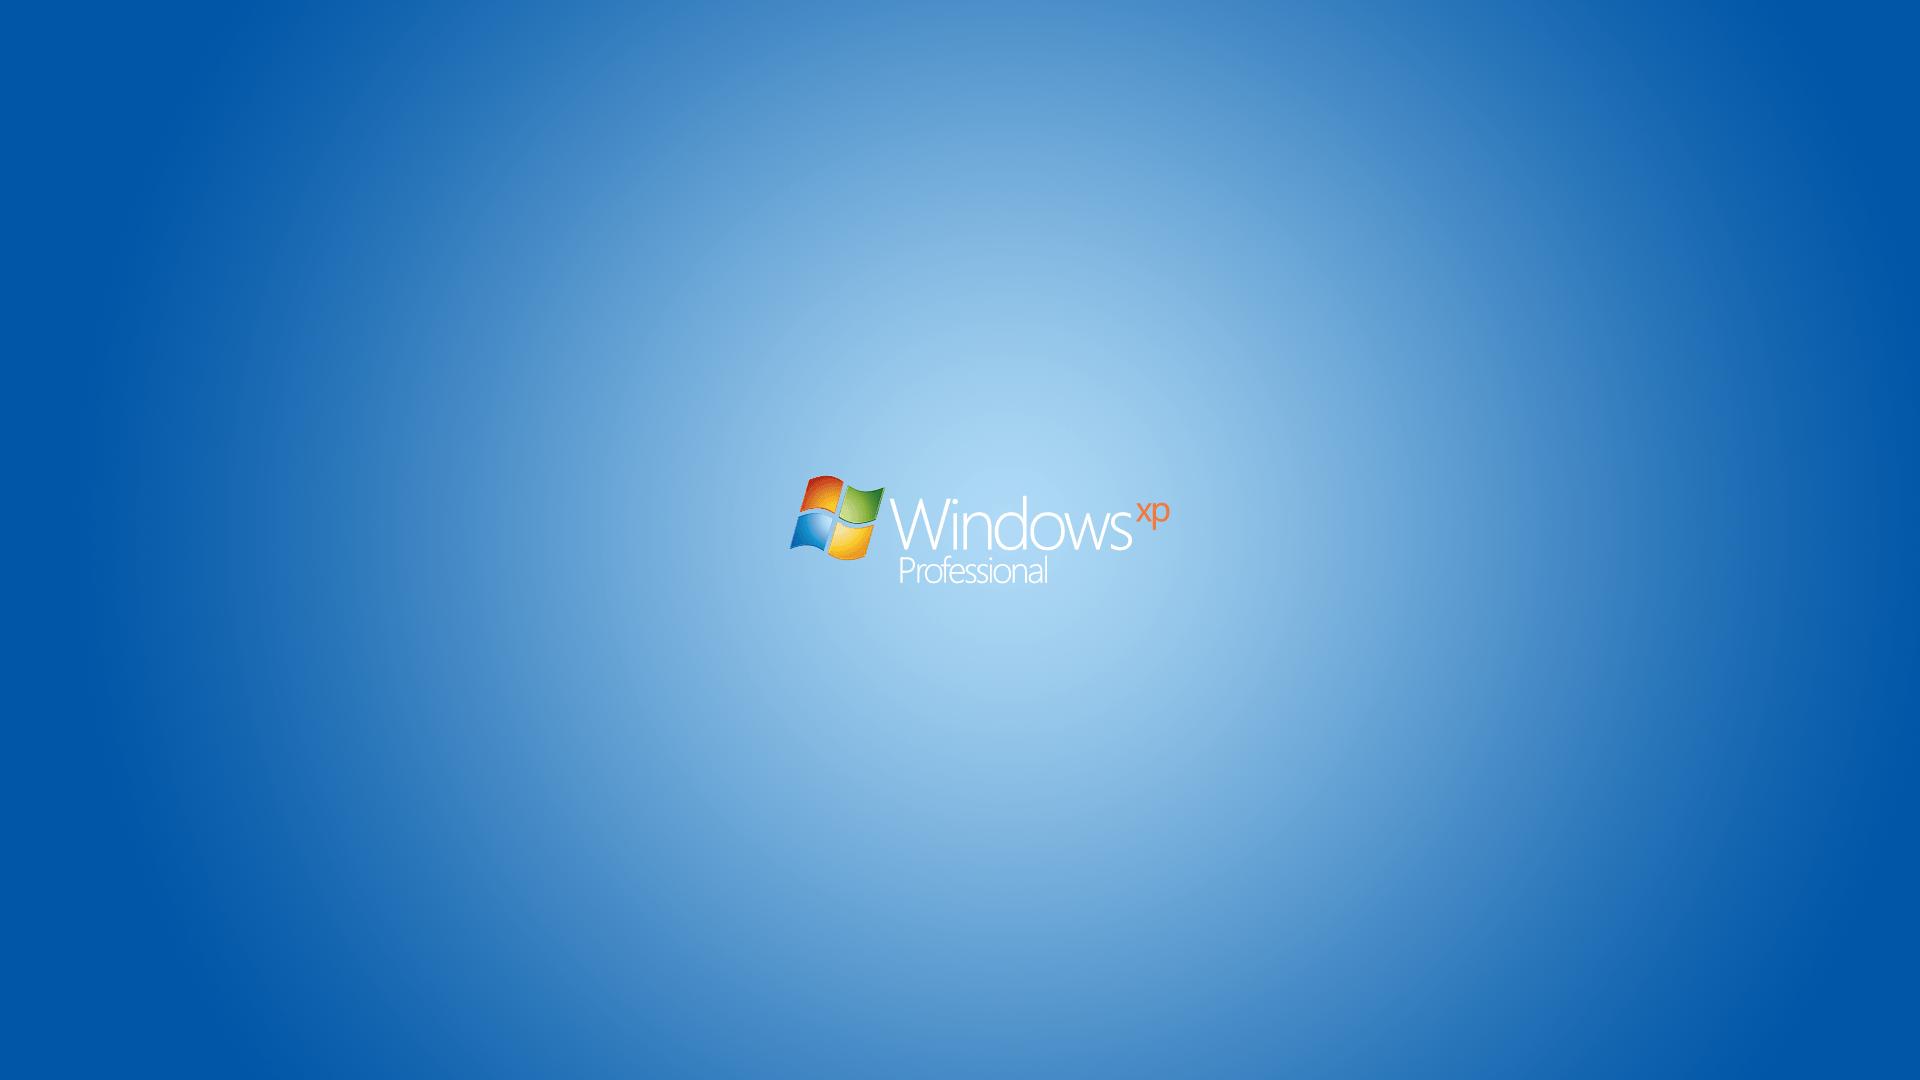 Download 960 Wallpaper Animasi Bergerak Untuk Windows Xp Gambar HD Paling Keren